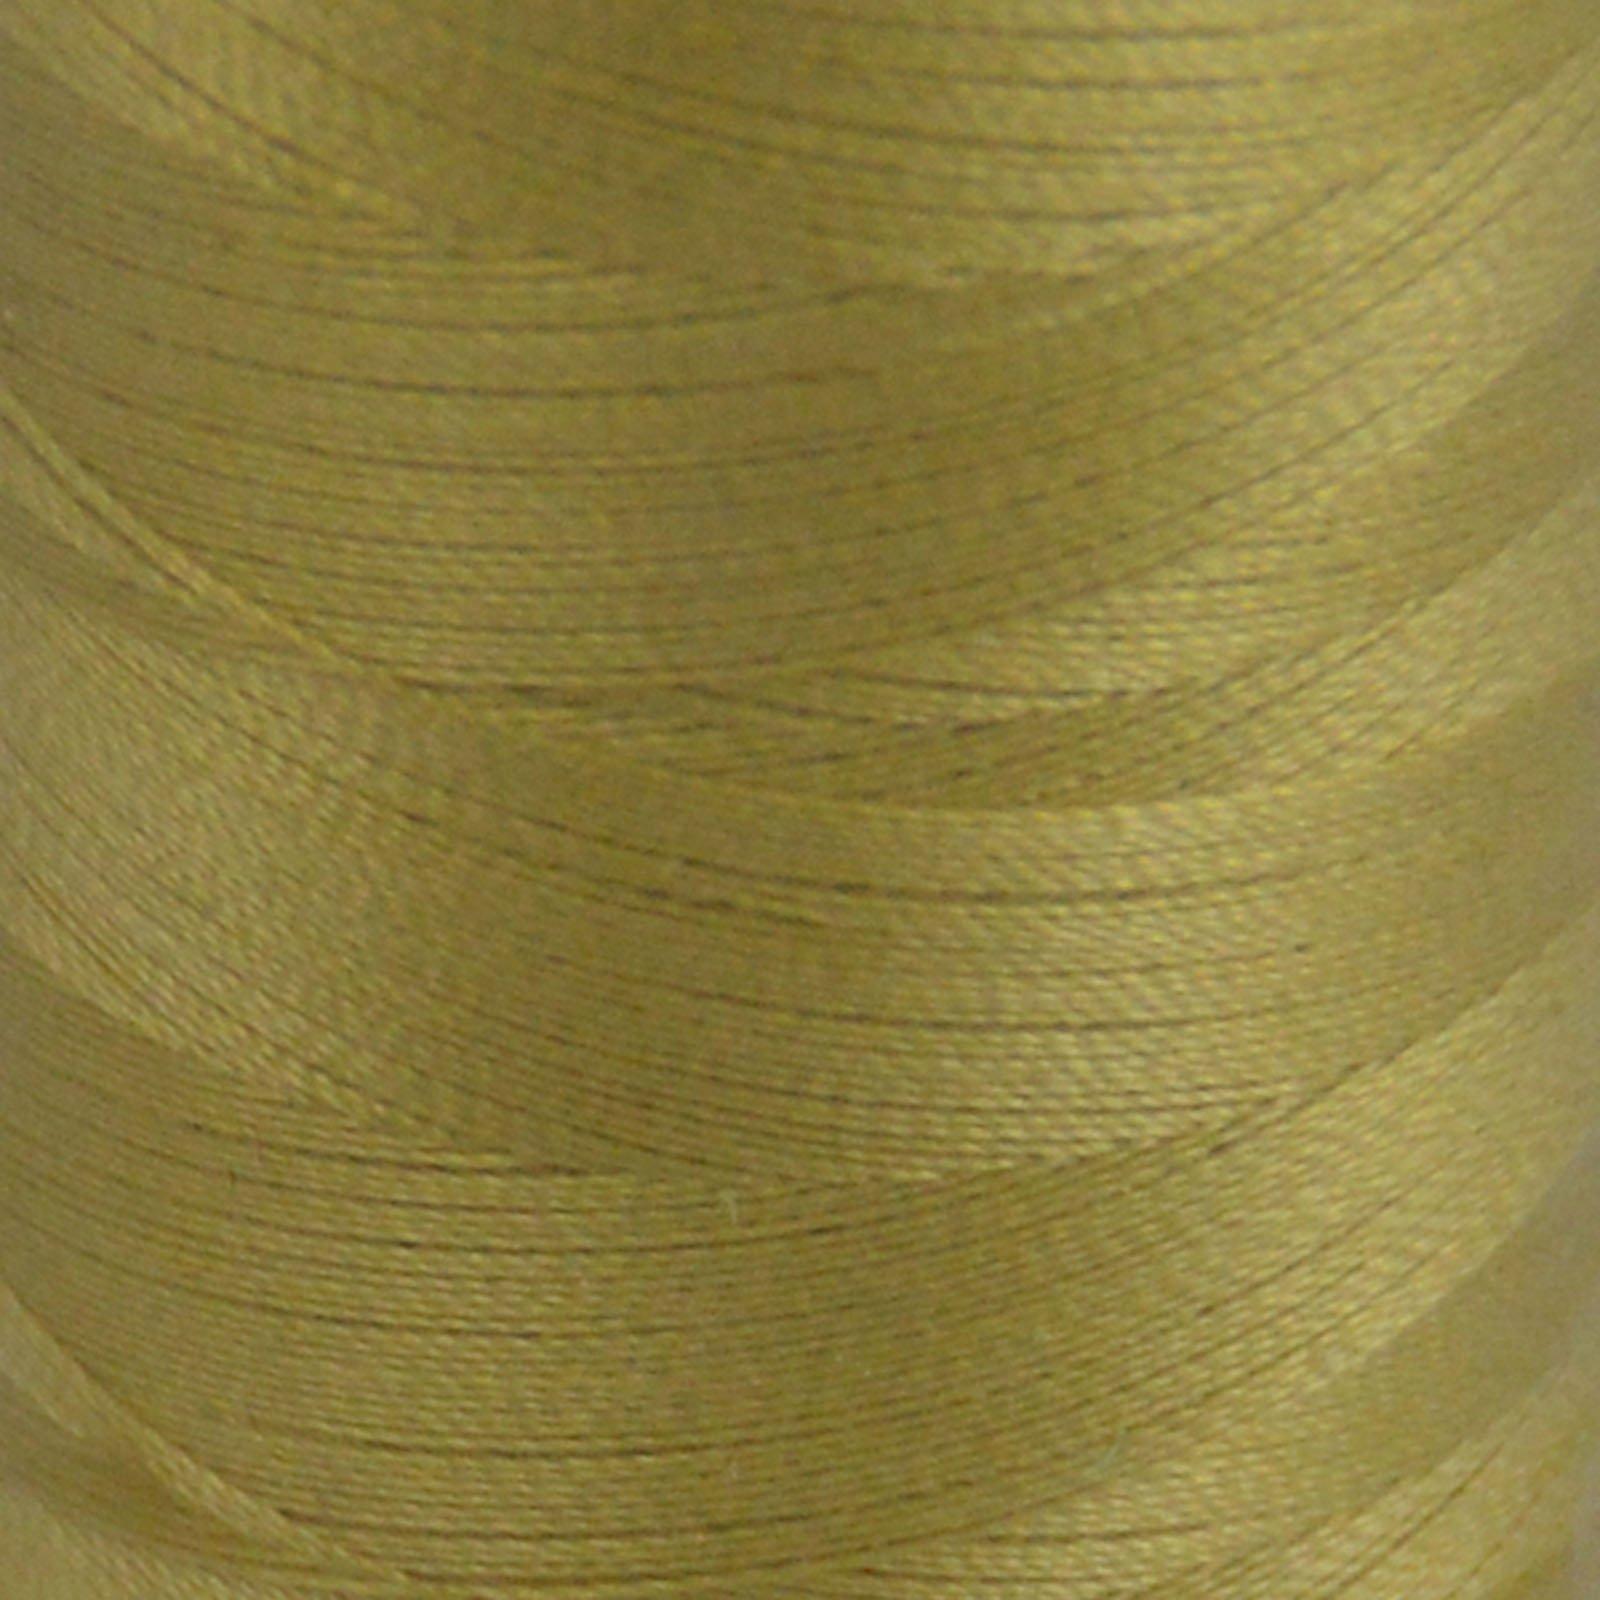 # 2915 Very Light Brass